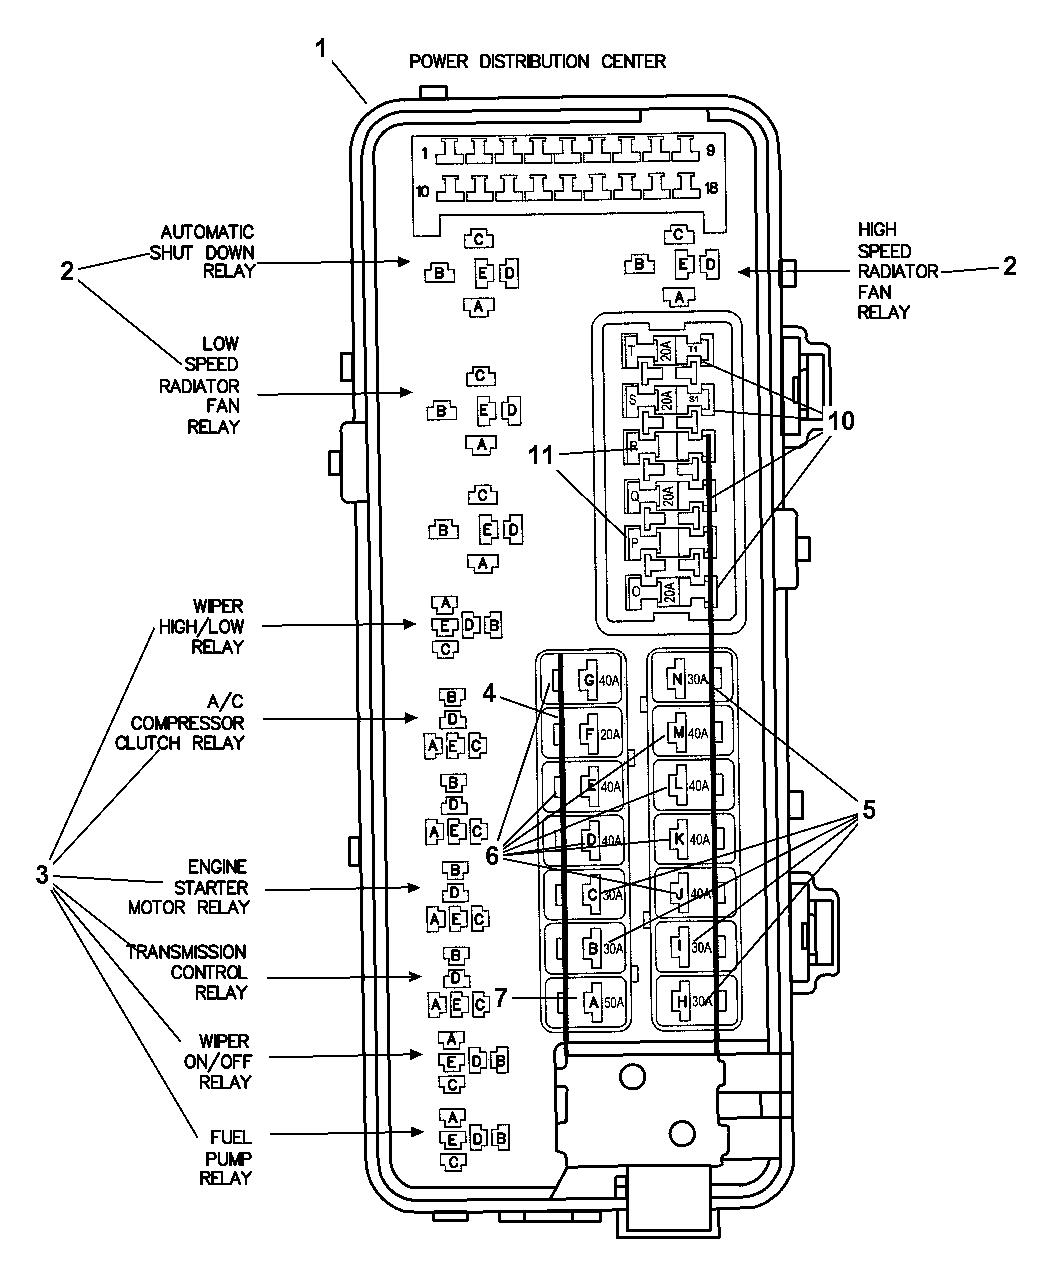 2002    Chrysler       300M    Power Distribution Center  Relays      Fuses